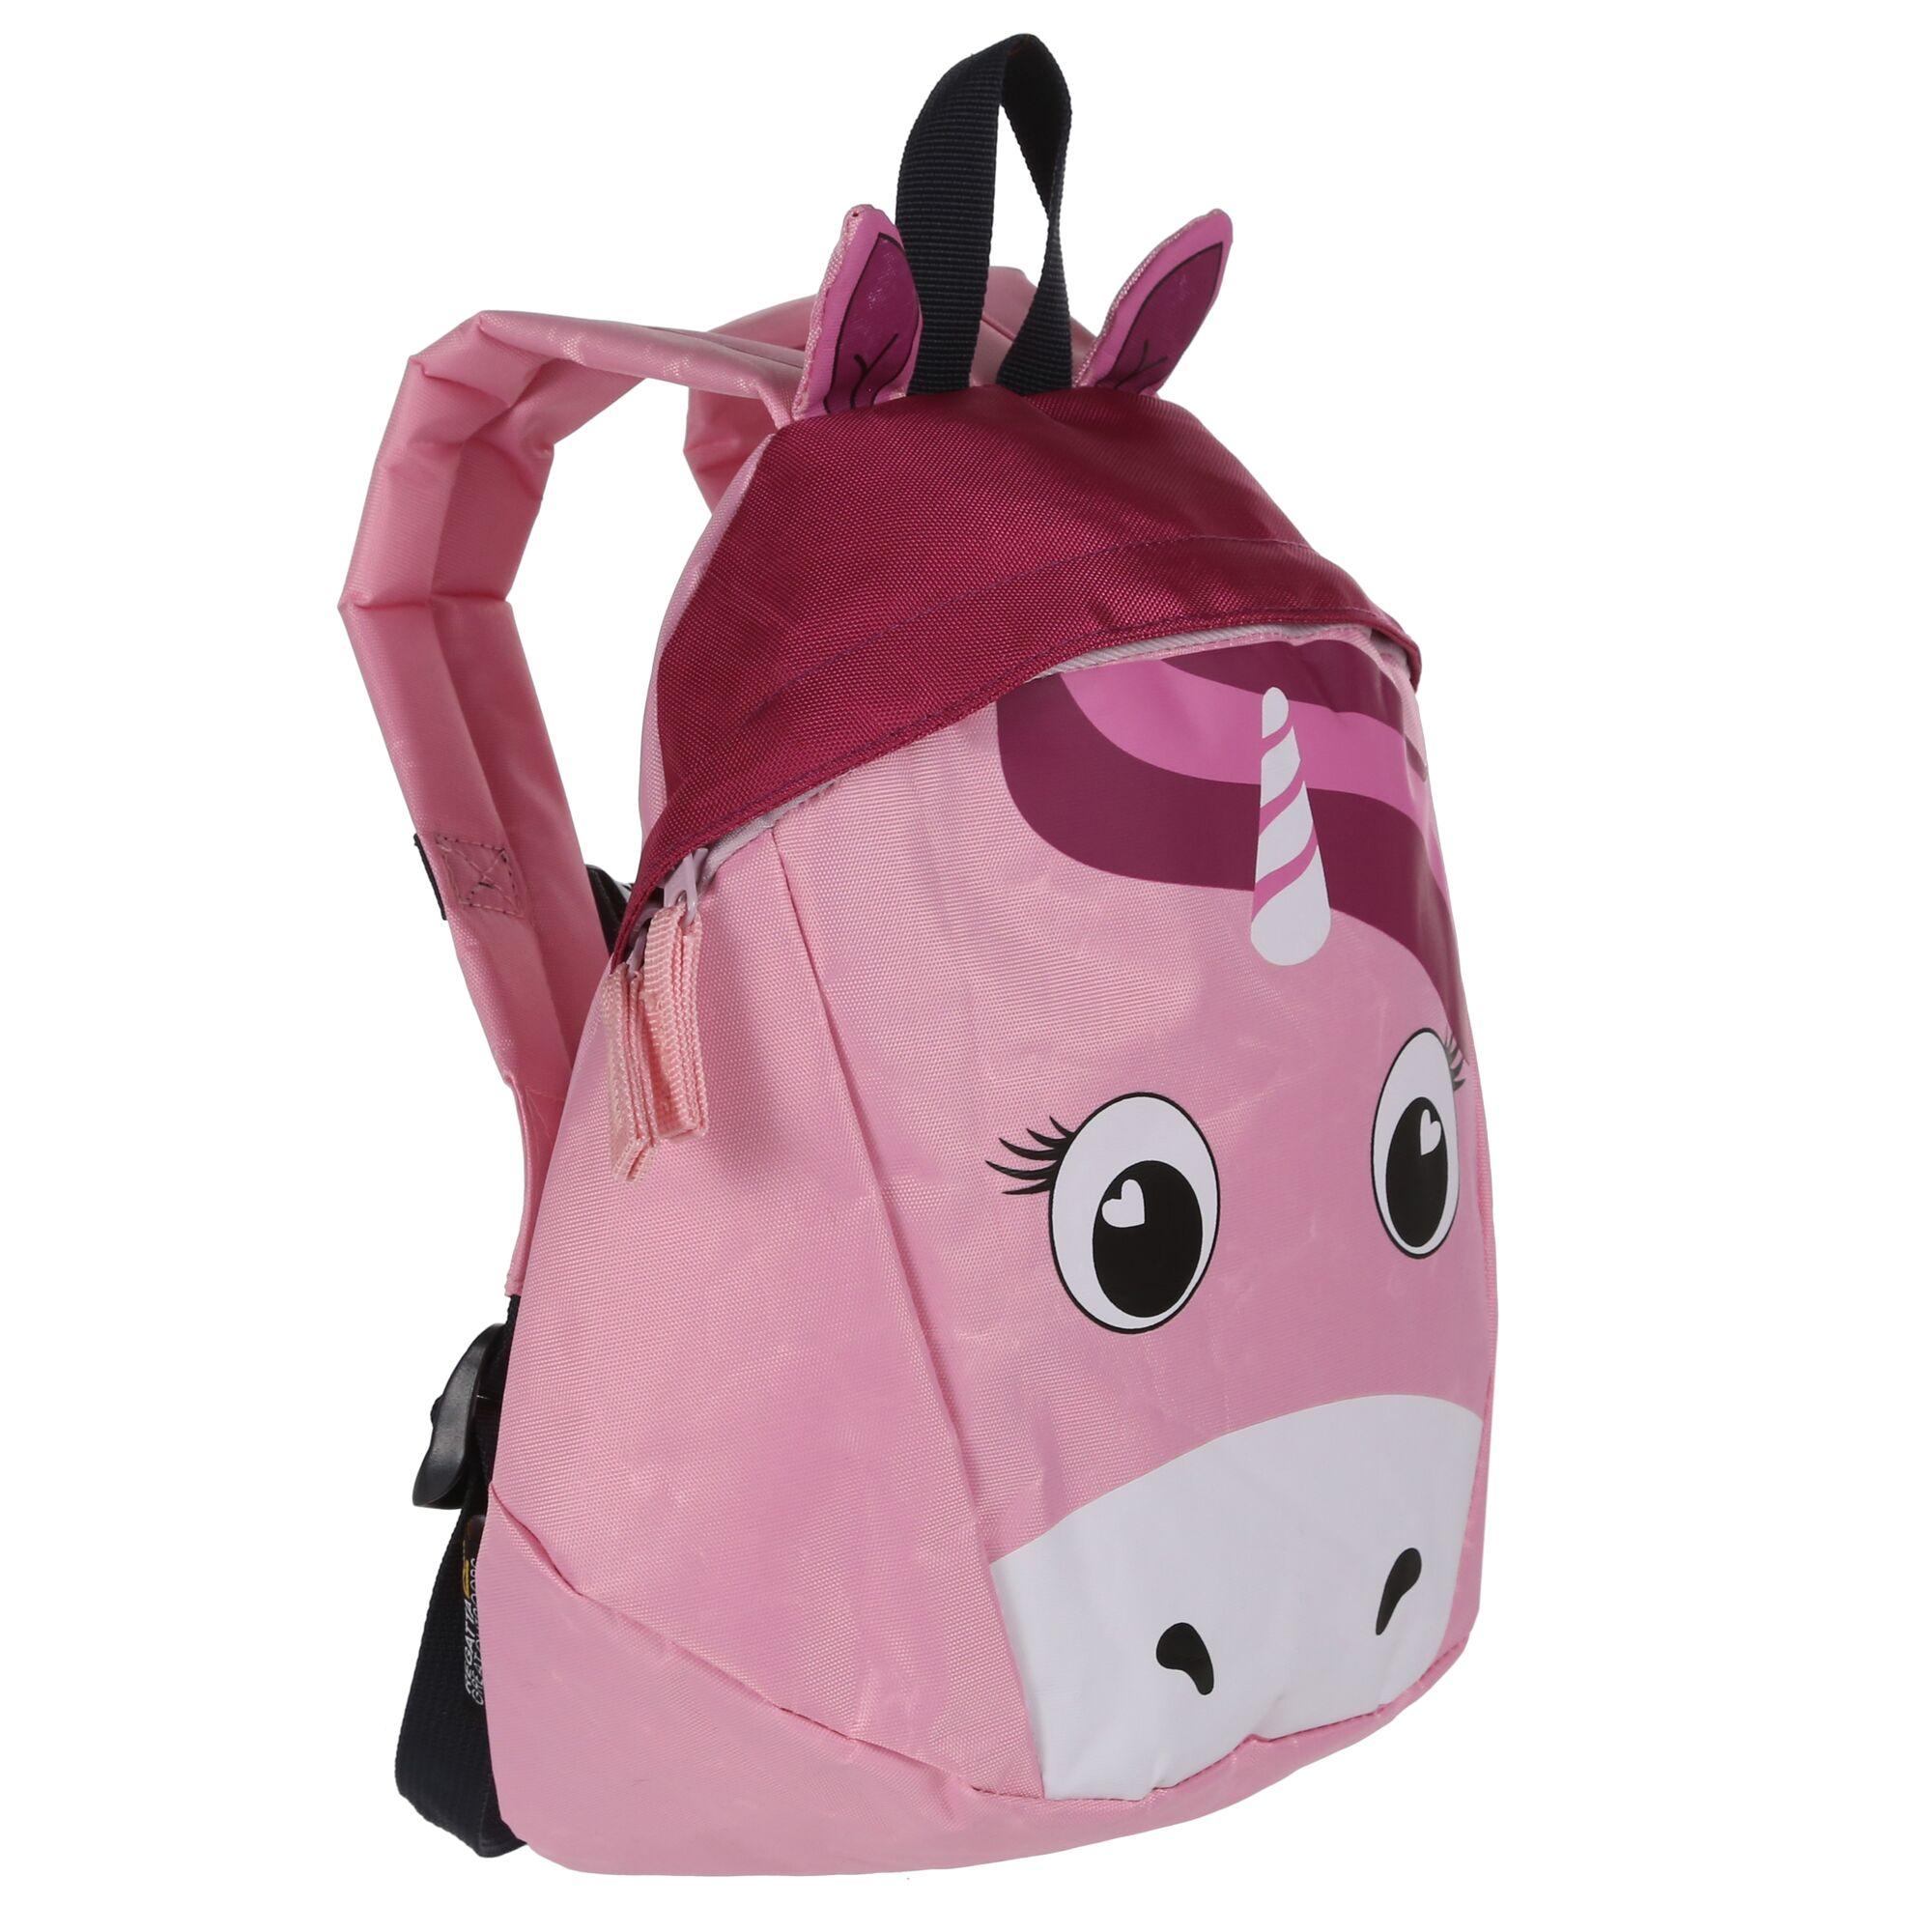 Regatta Kids/' Roary Animal Backpack Pink